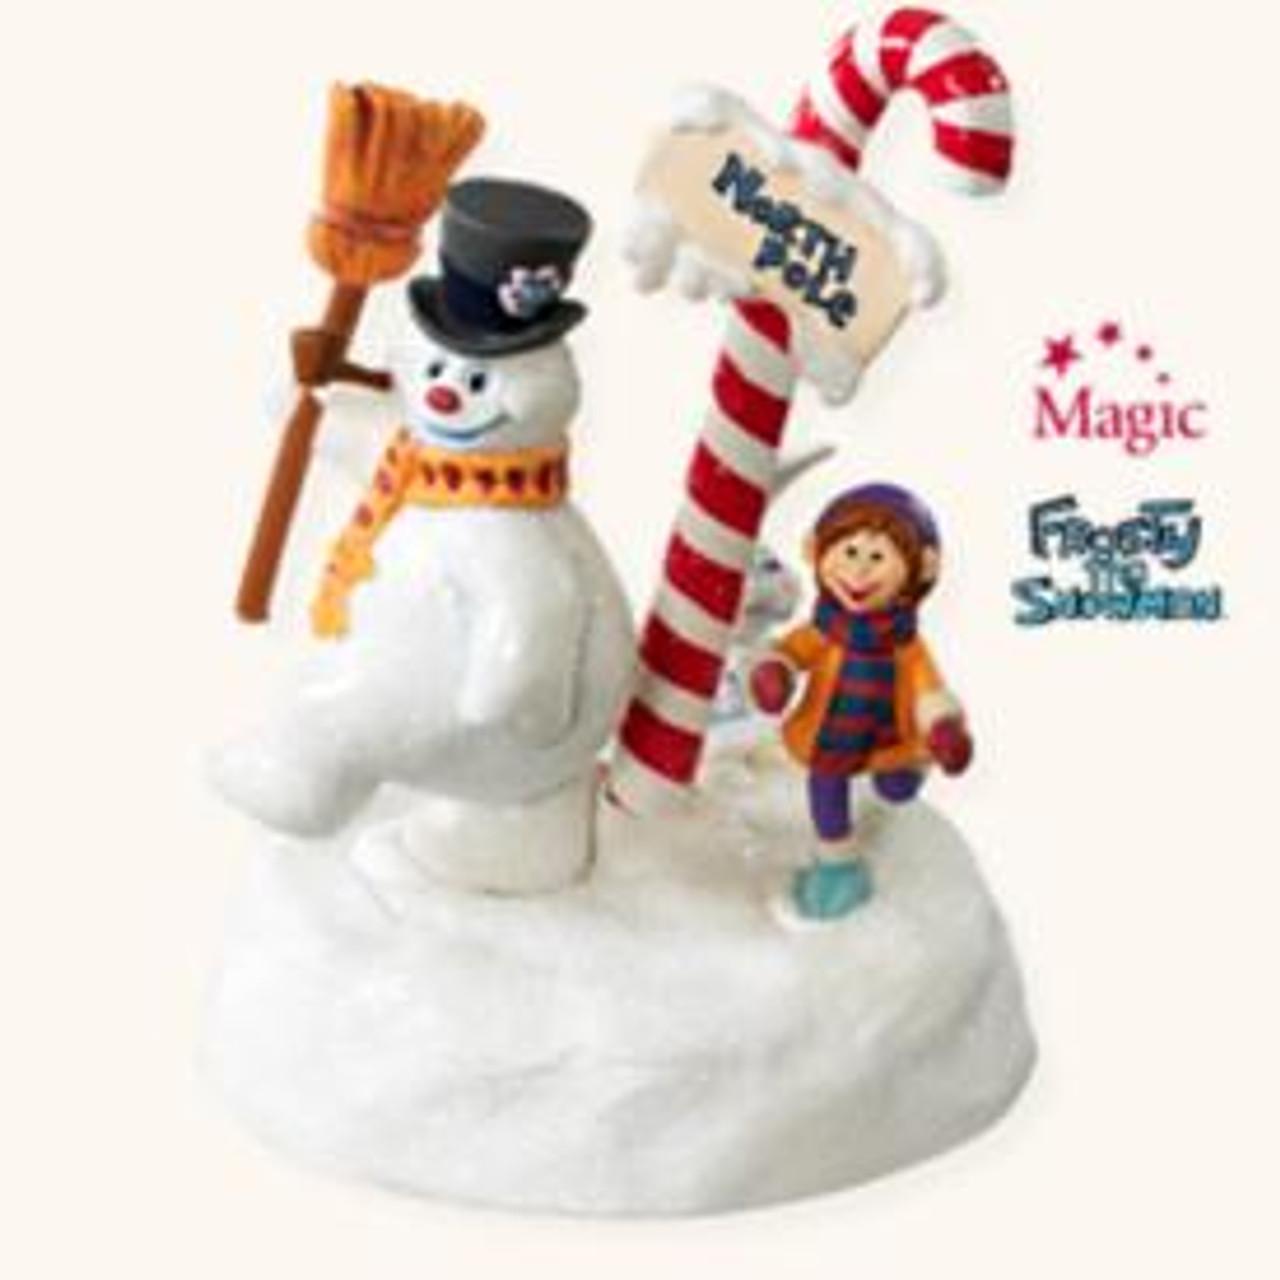 Frosty Snowman Ornament